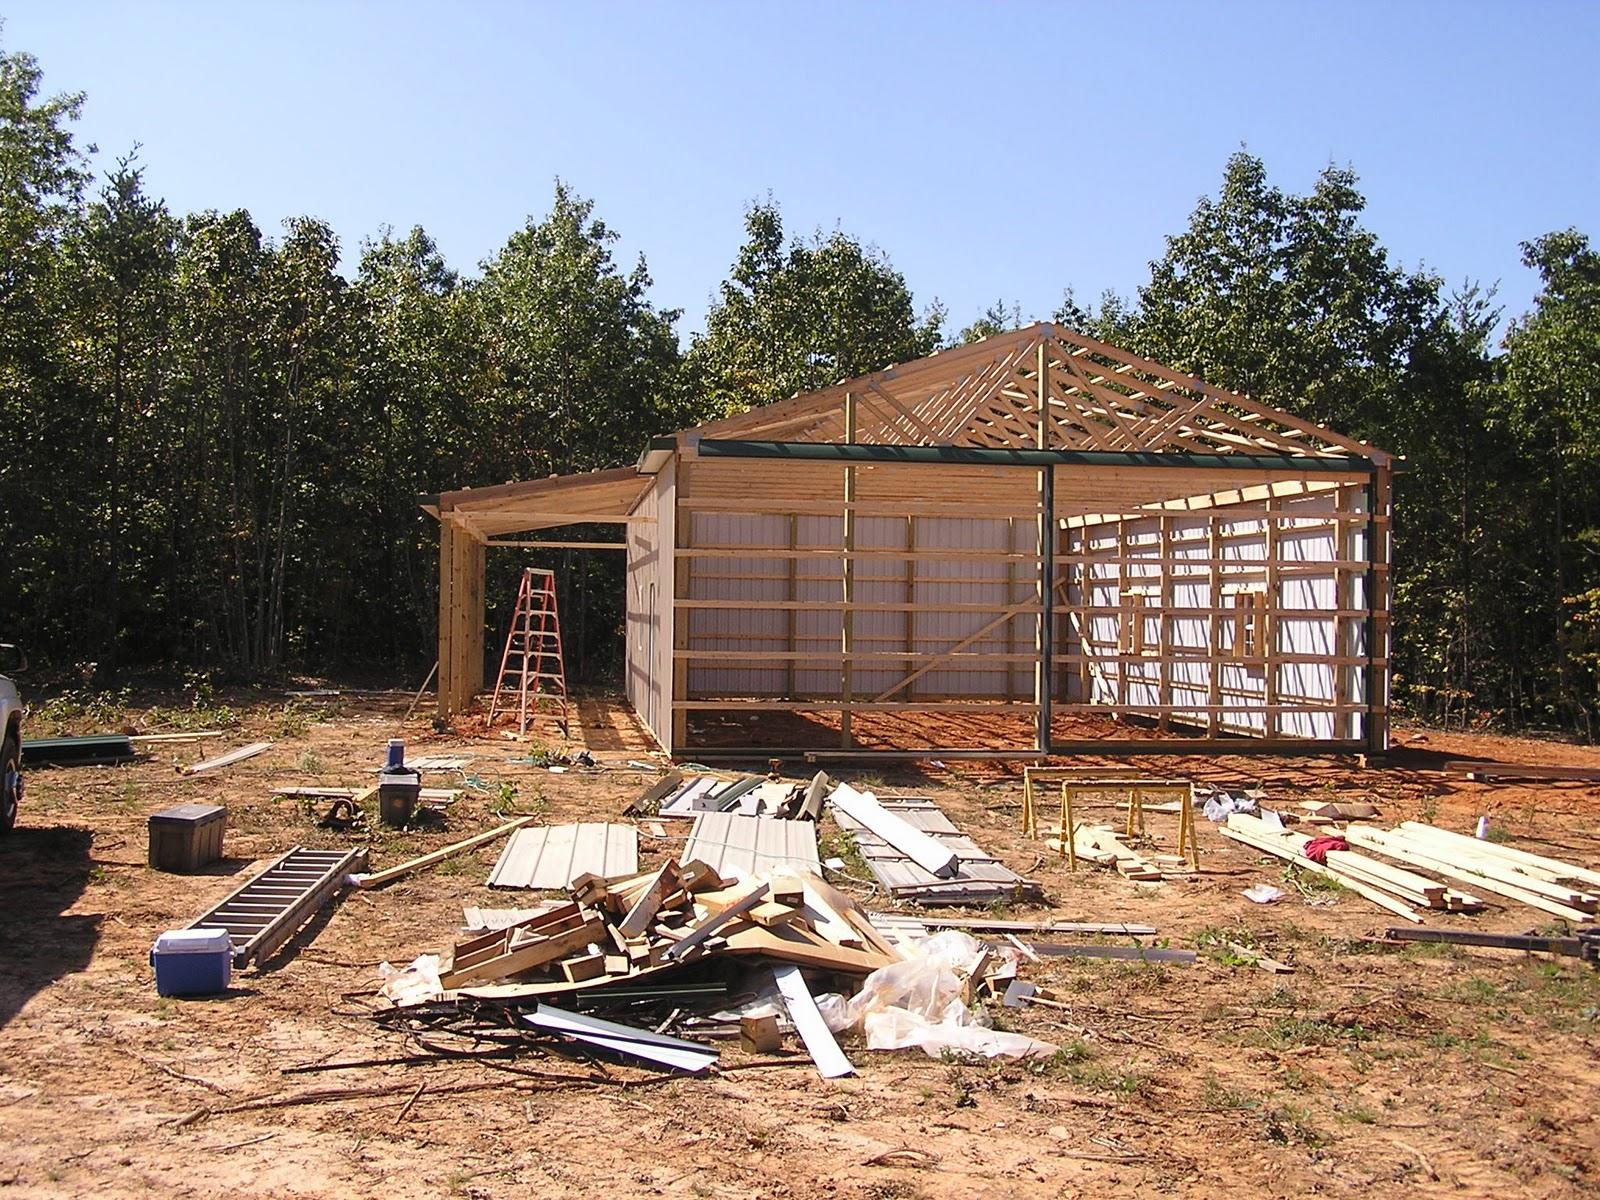 Appomattox Loghome A Pole Barn Is Constructed